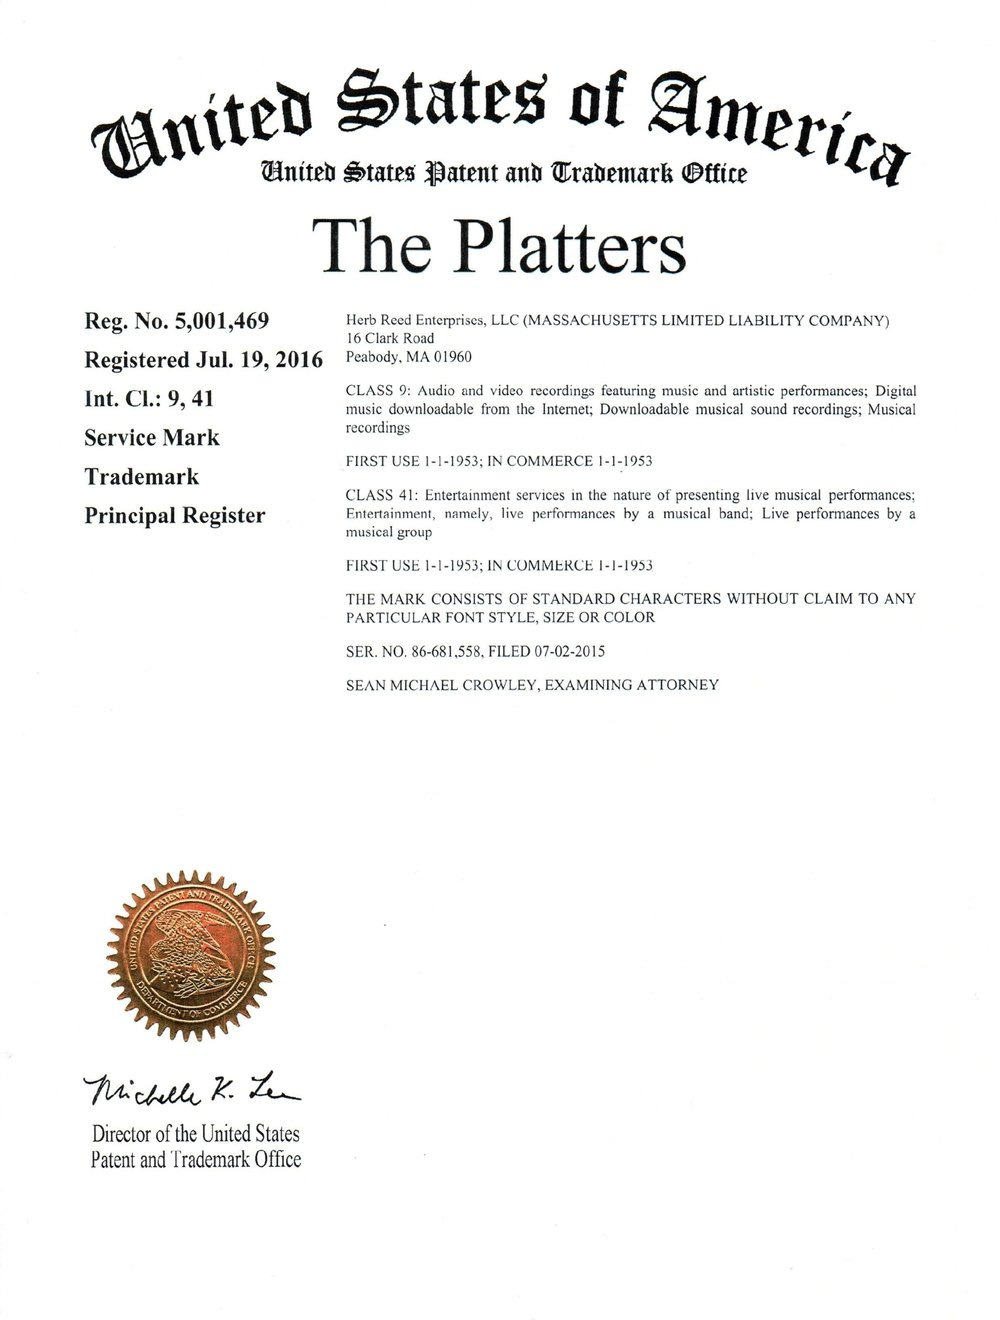 Platters Trademark.jpg